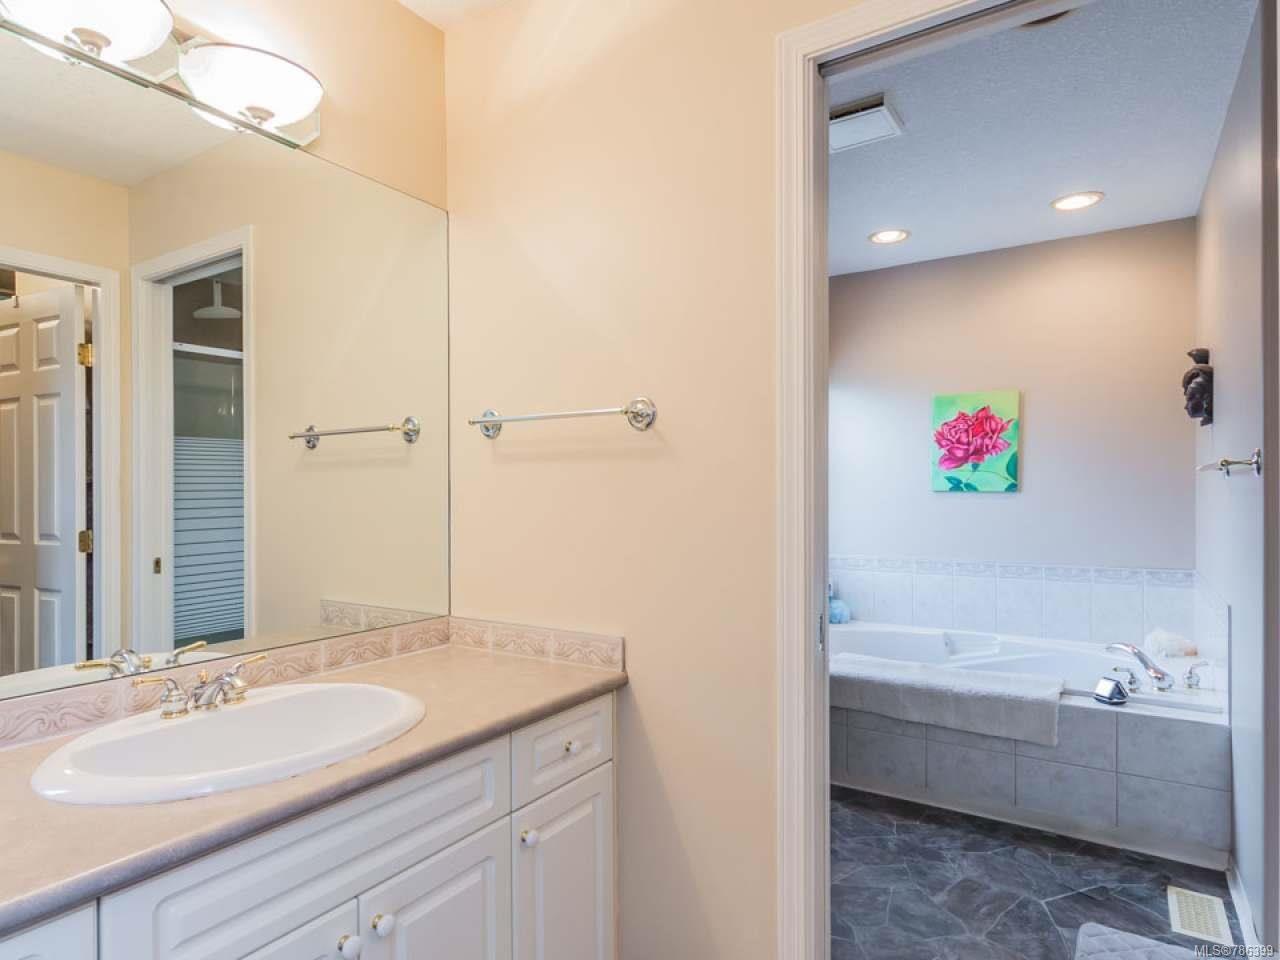 Photo 23: Photos: 5371 HIGHRIDGE PLACE in NANAIMO: Na North Nanaimo House for sale (Nanaimo)  : MLS®# 786399